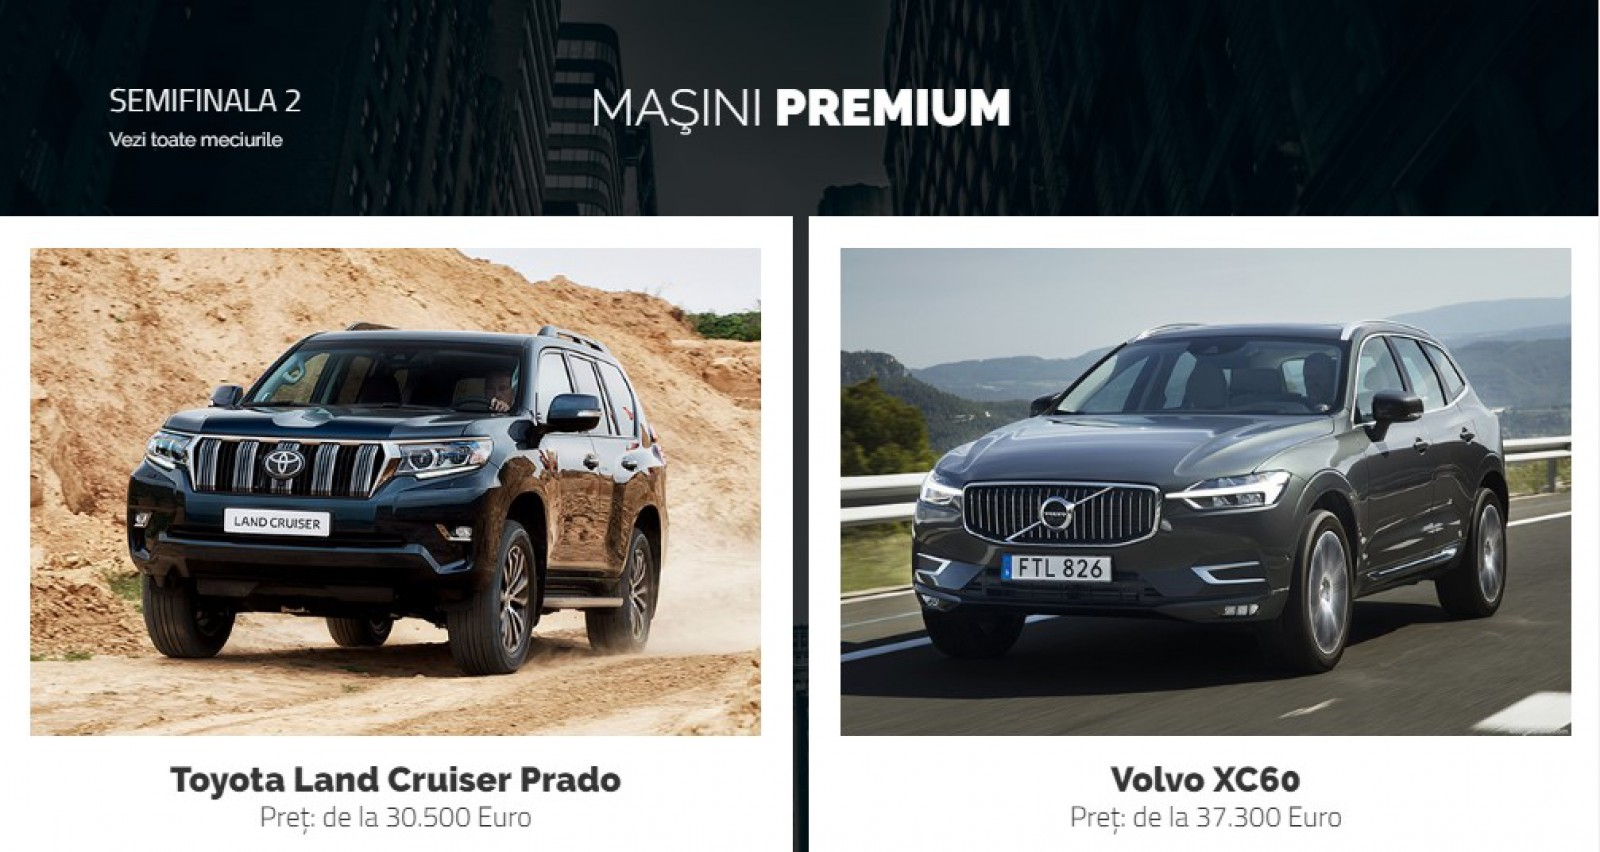 AUTOVOT MOLDOVA 2018! Semifinala II din categoria Maşini Premium: Toyota Land Cruiser Prado vs Volvo XC60!